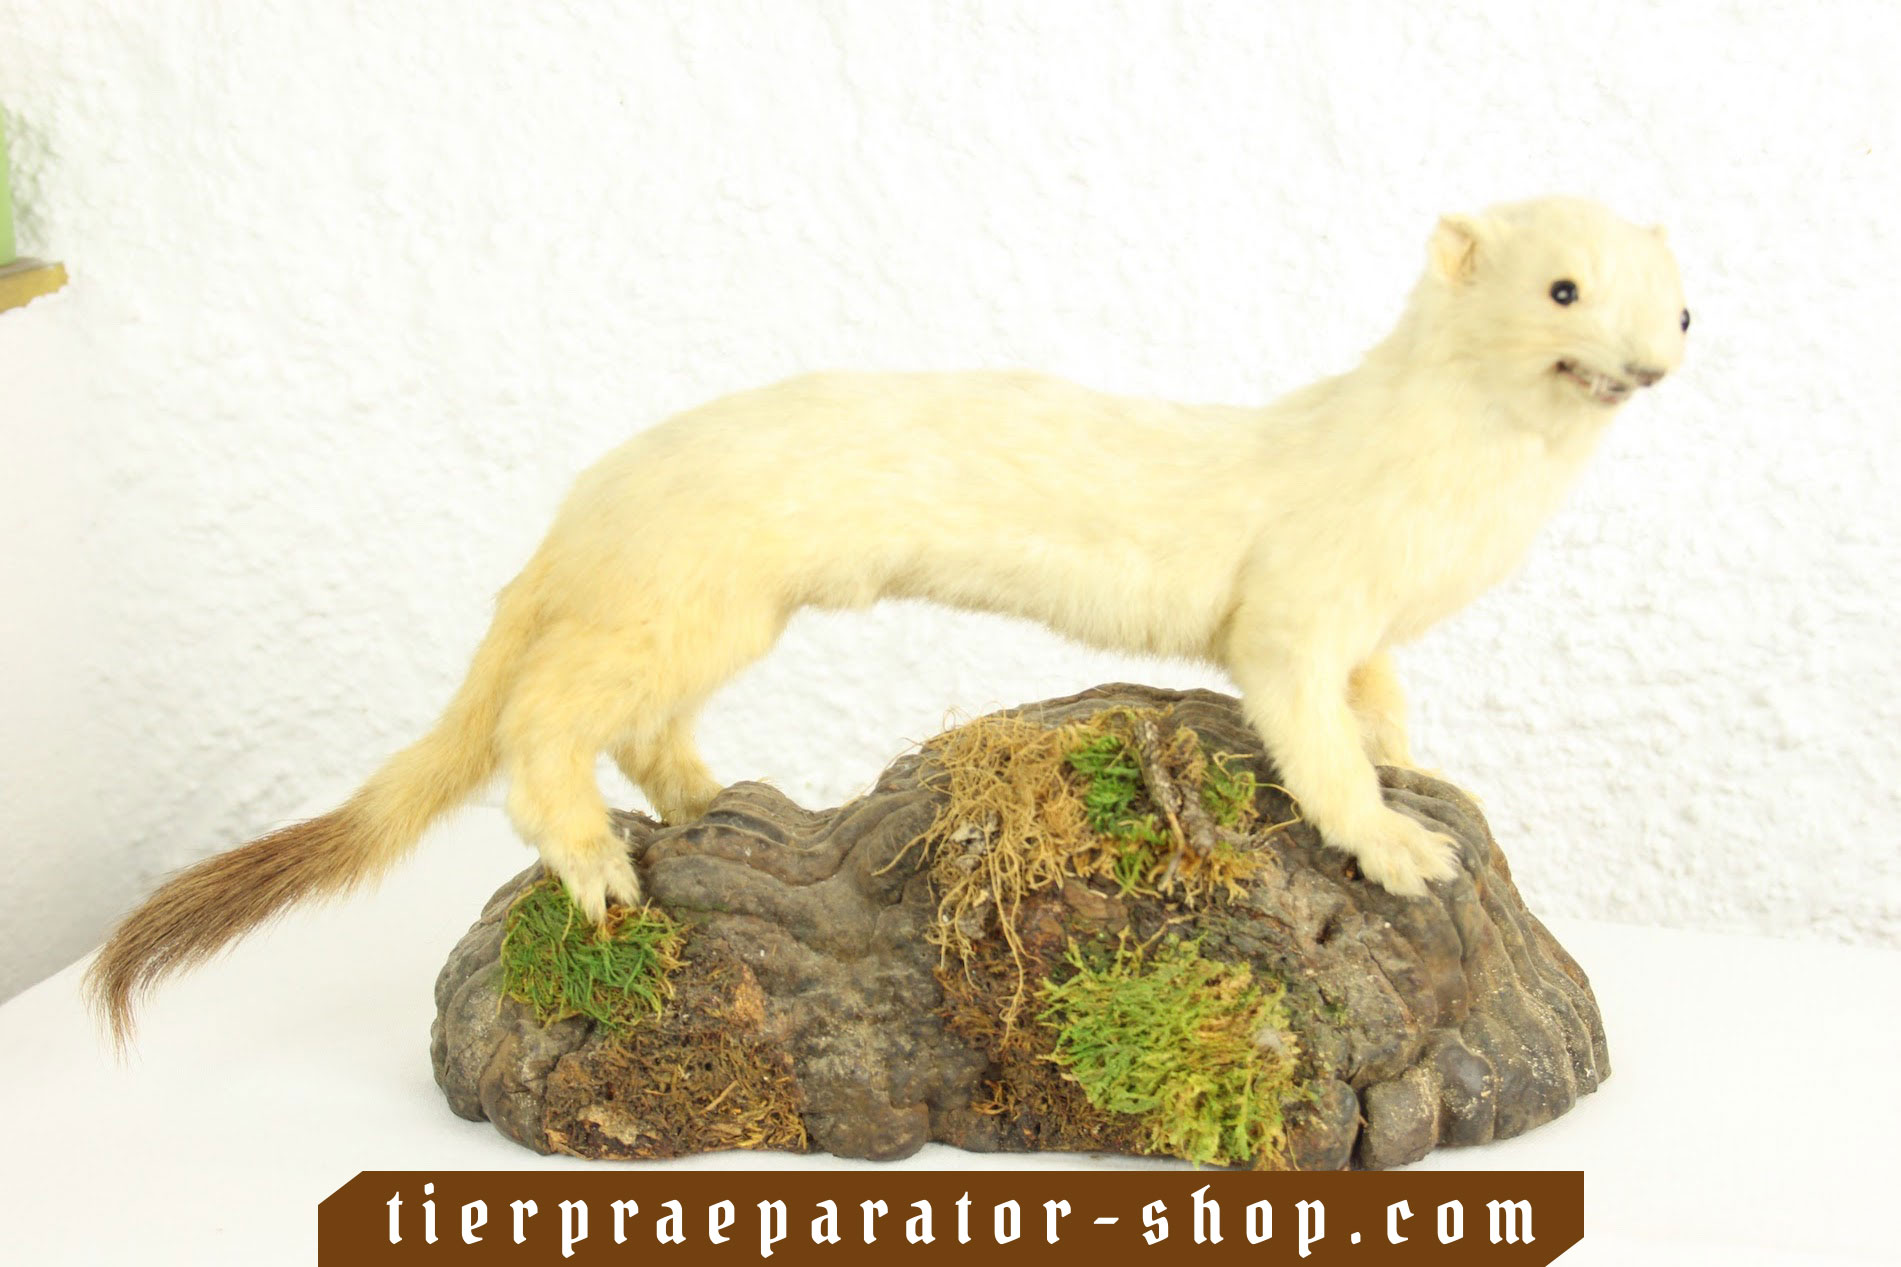 Tierpraeparator-Shop.com-Tierpraeparate-kaufen-533